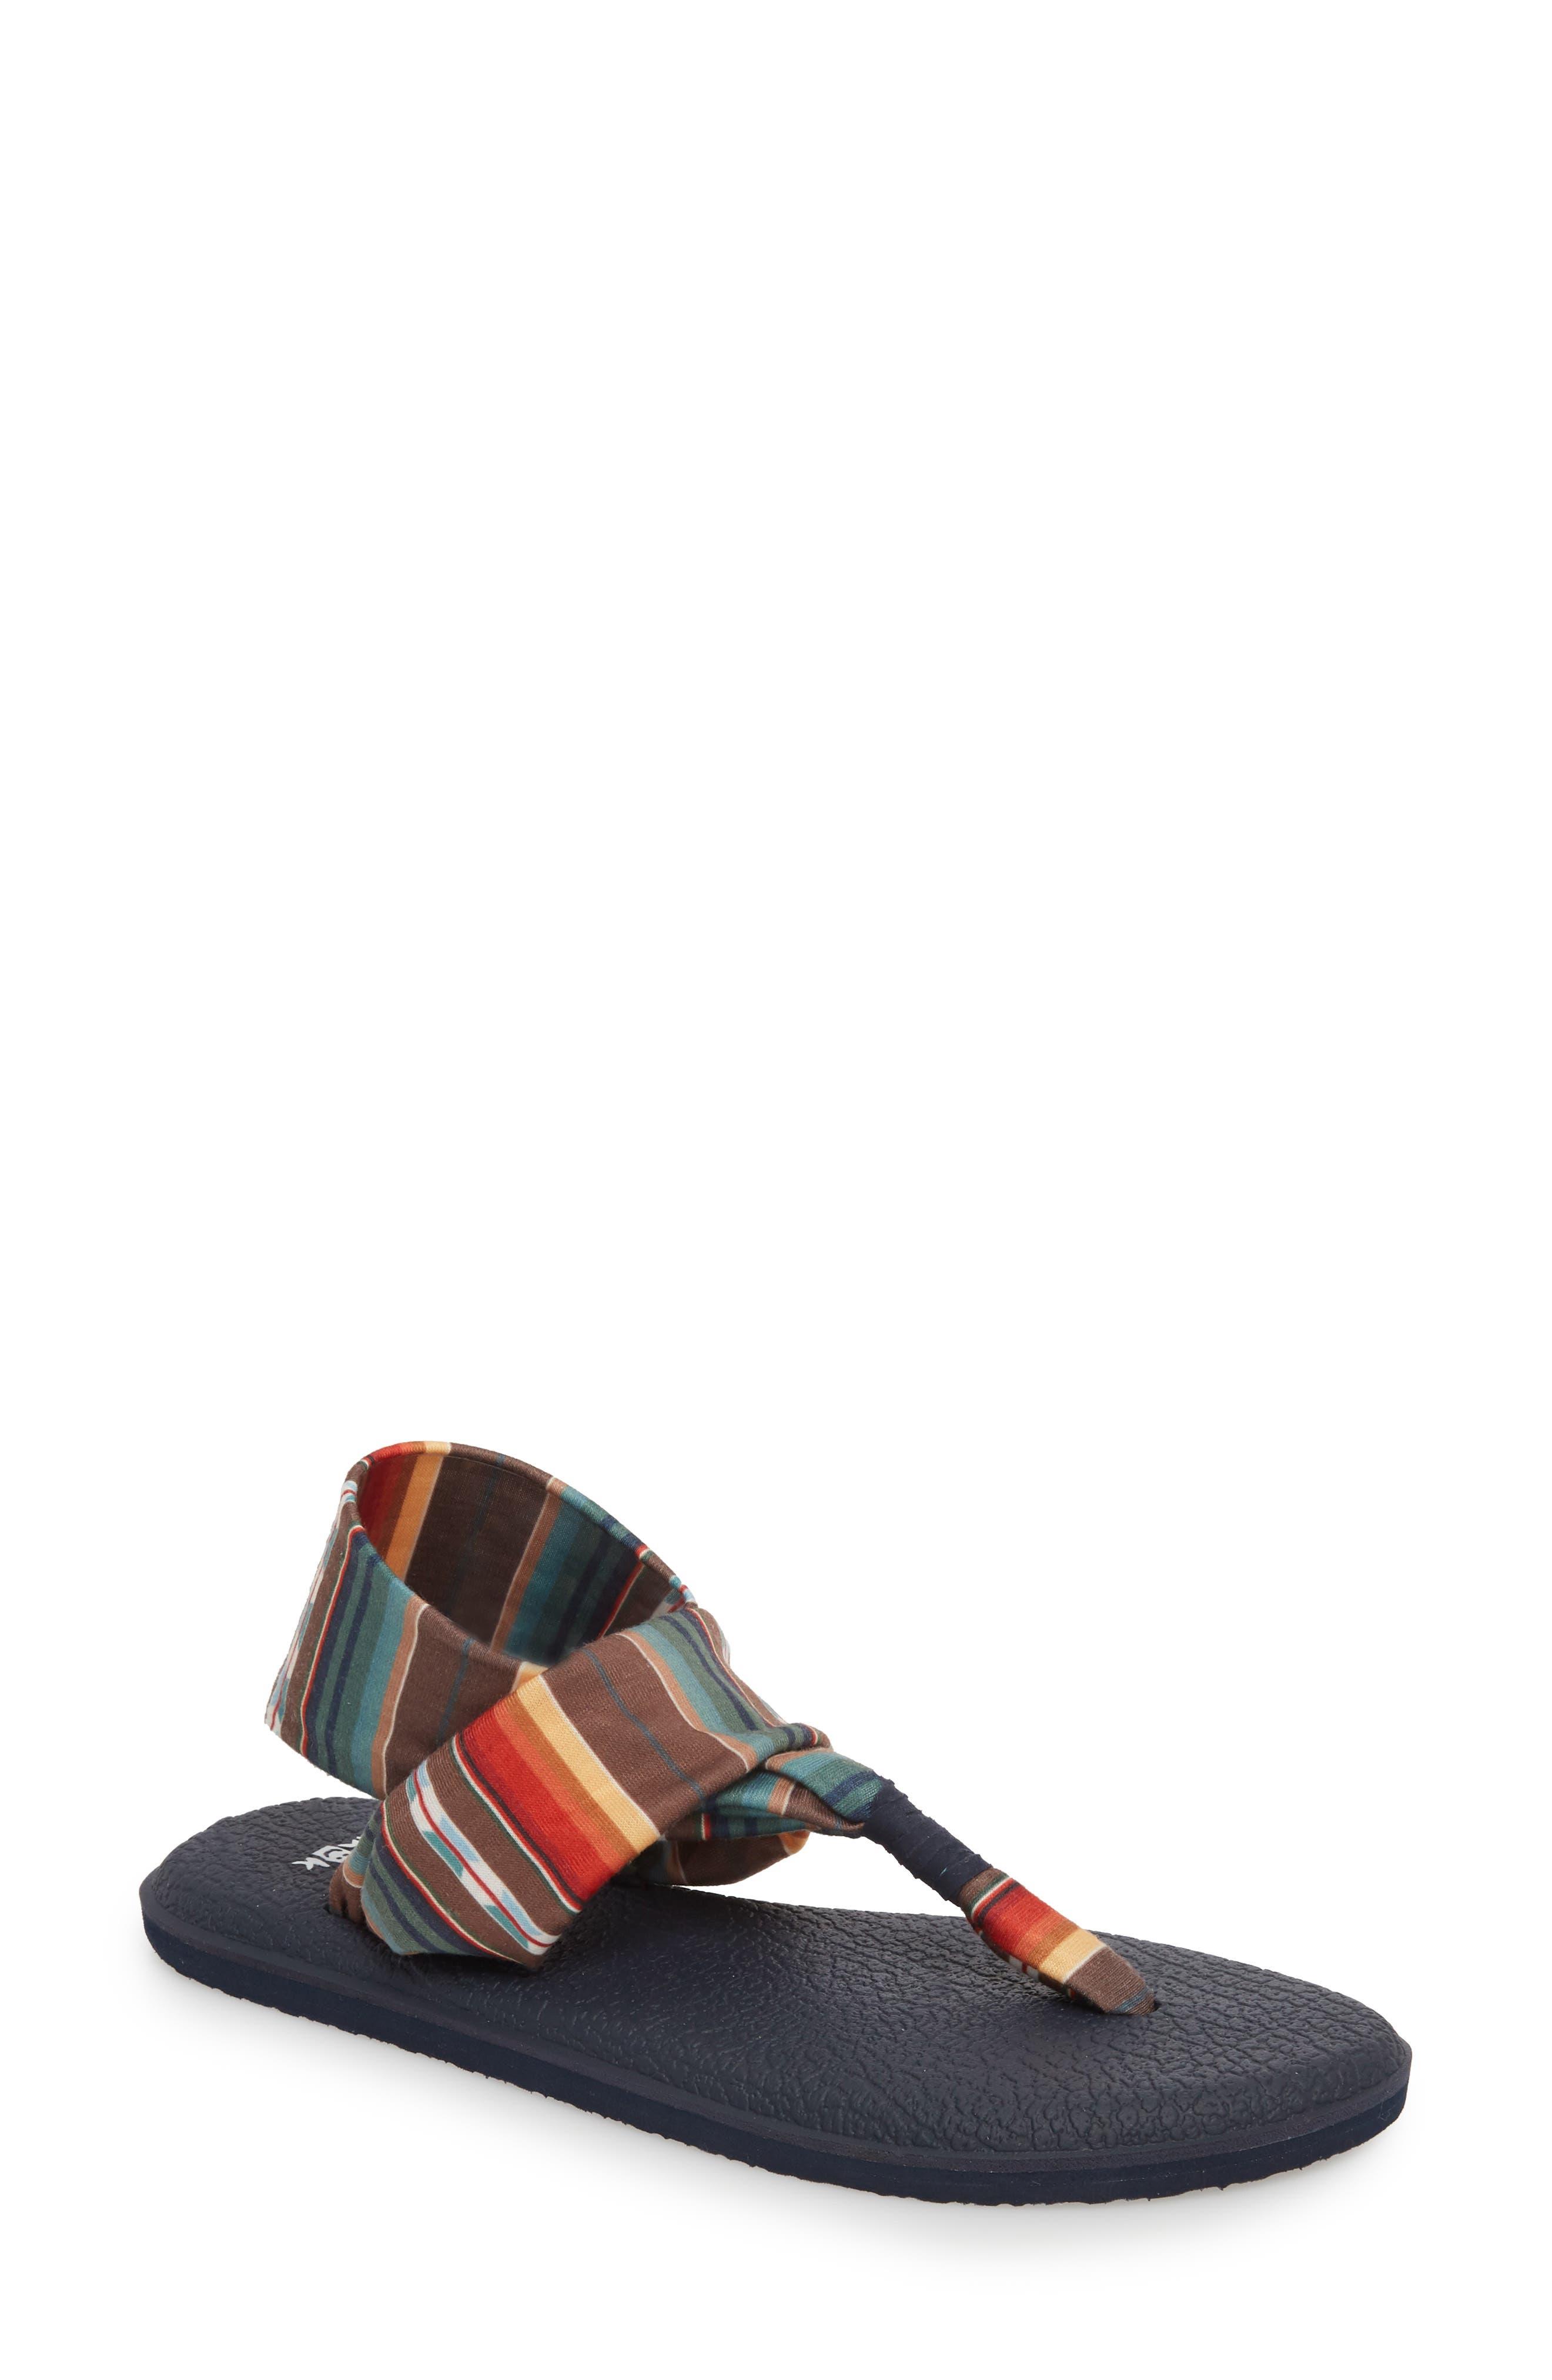 mats sandals flip sanuk flop snuk yoga women fashion s mat womens